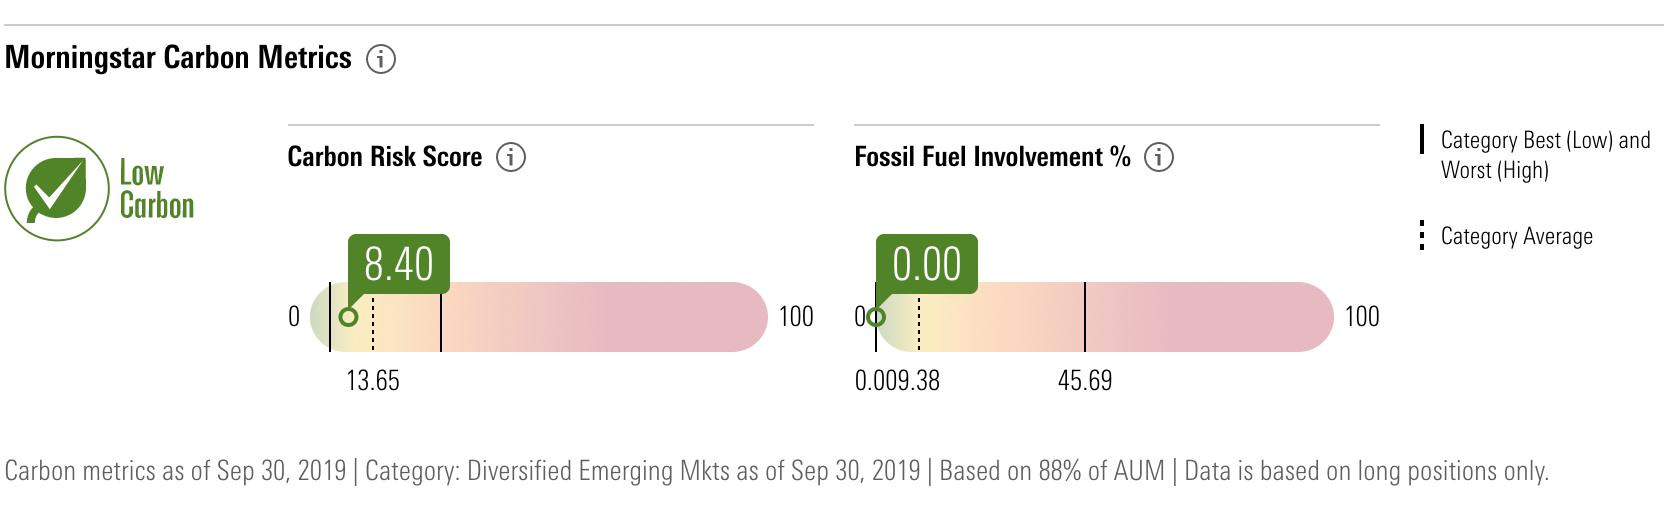 Morningstar sustainability ratings